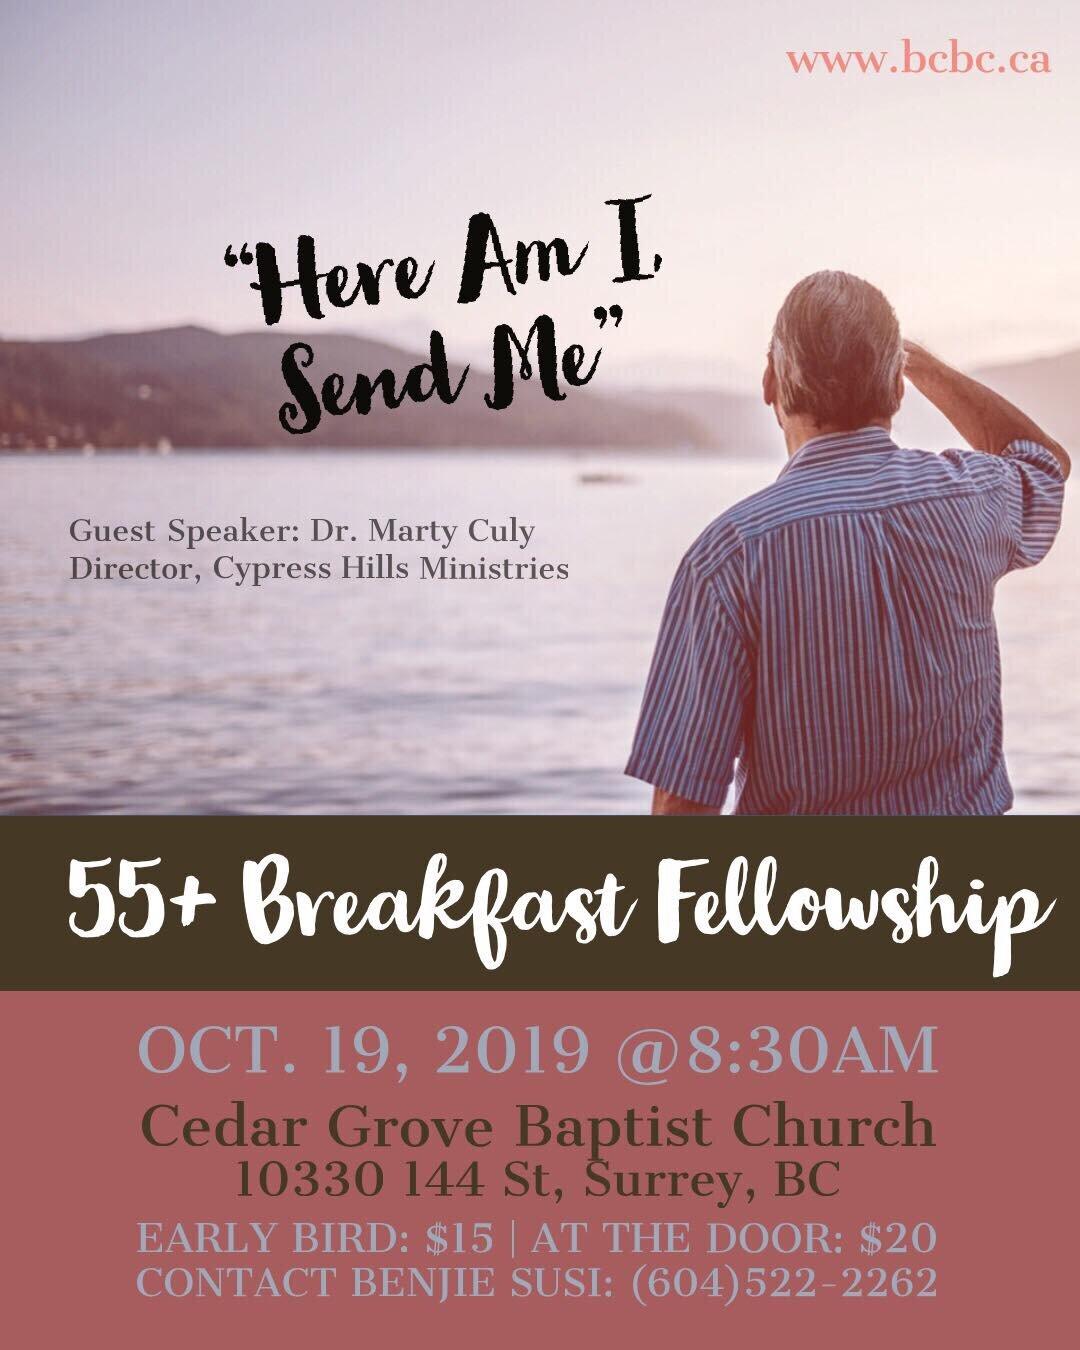 bcbc-55-breakfast-fellowship-poster-2019-002.jpg